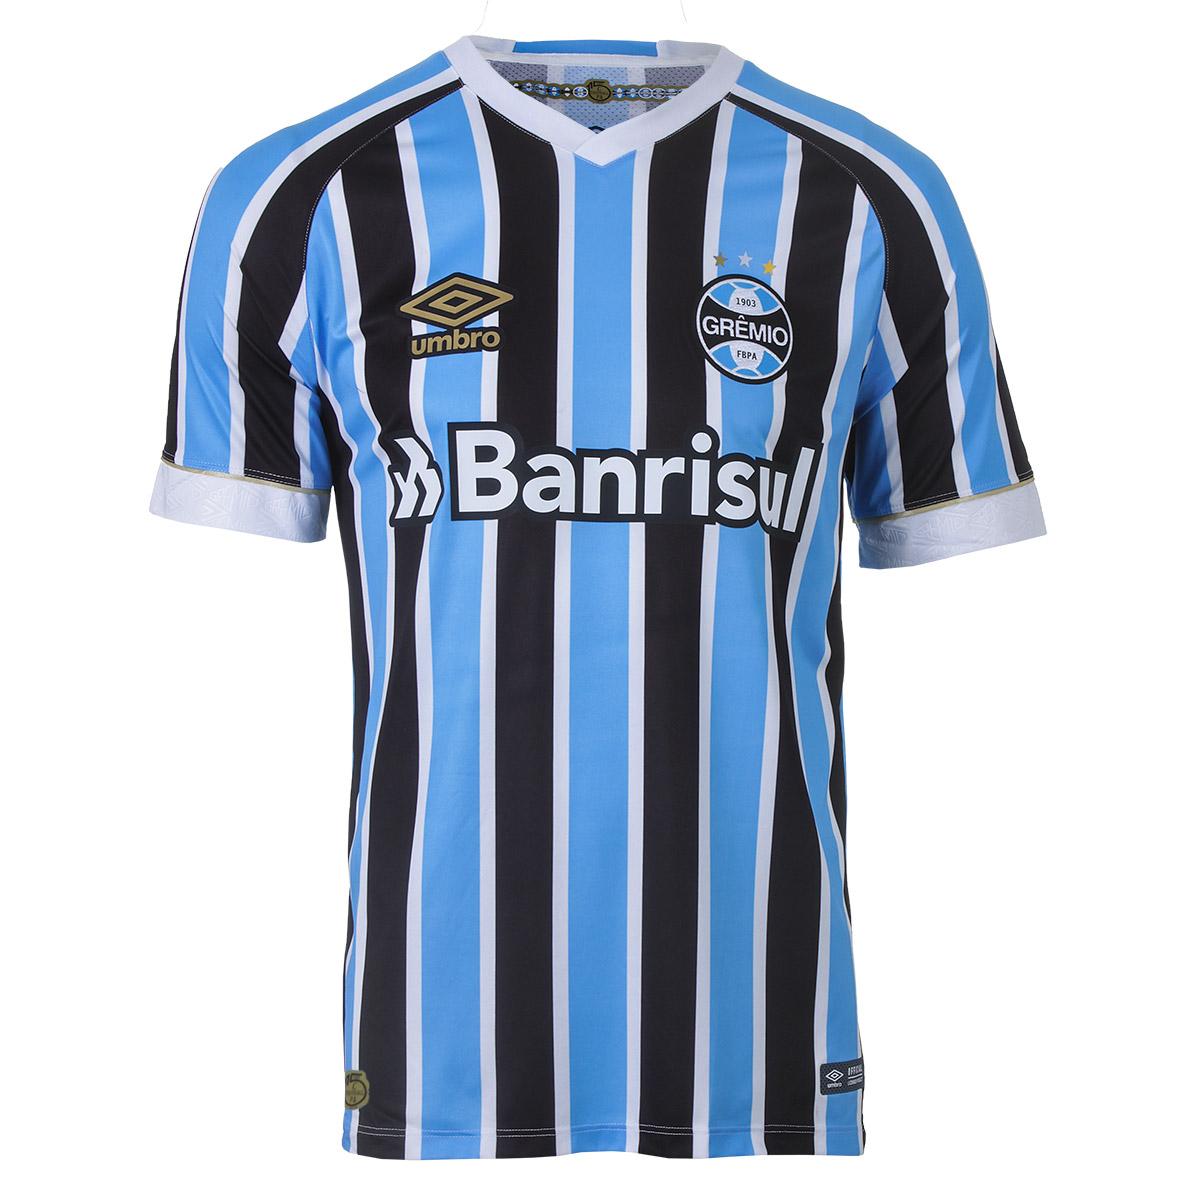 Camiseta Oficial Masc. Umbro Gremio - Azul/Branco